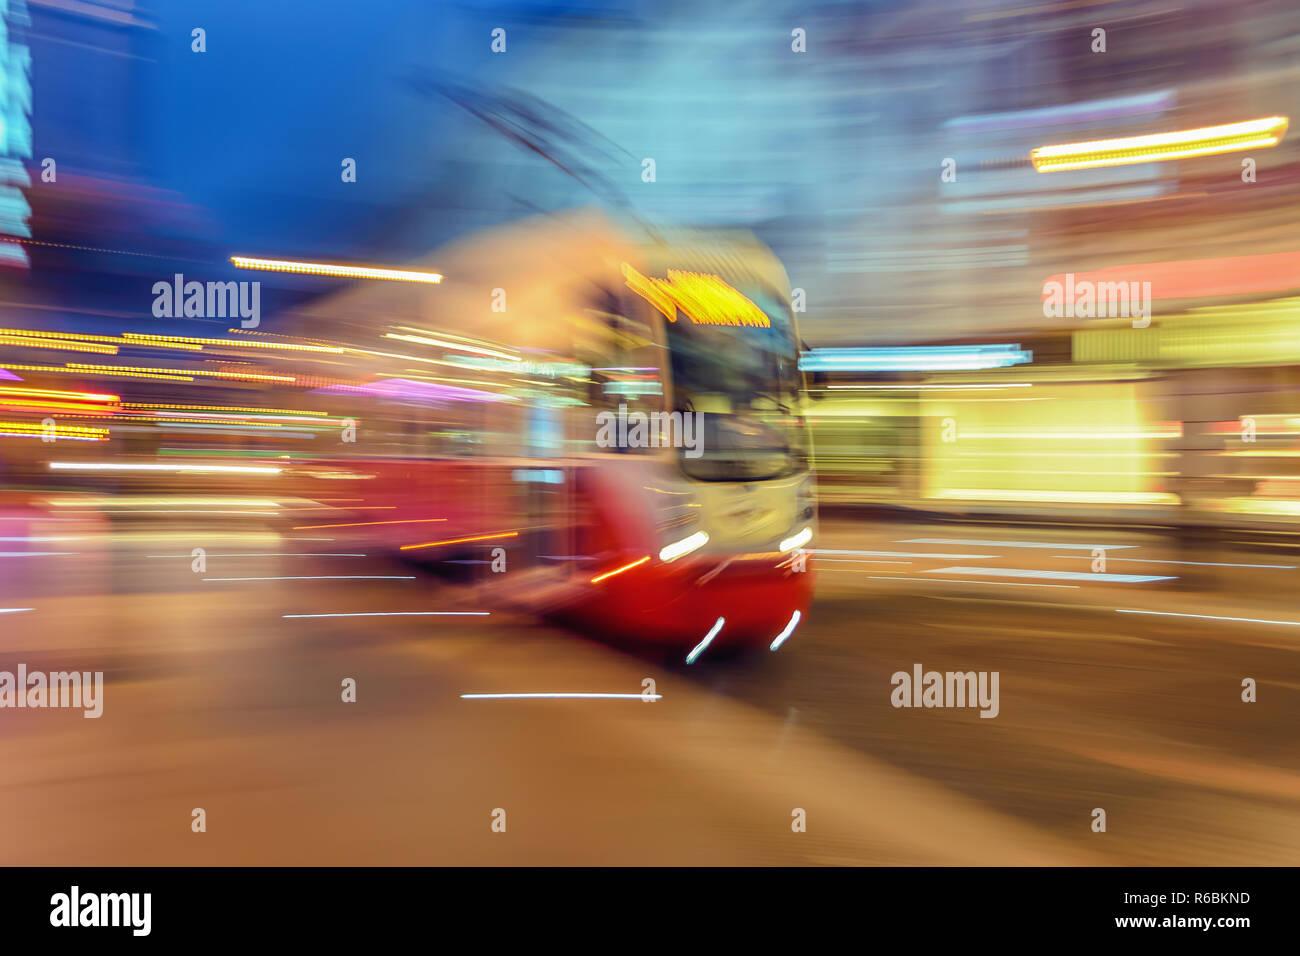 effect of technology on transportation